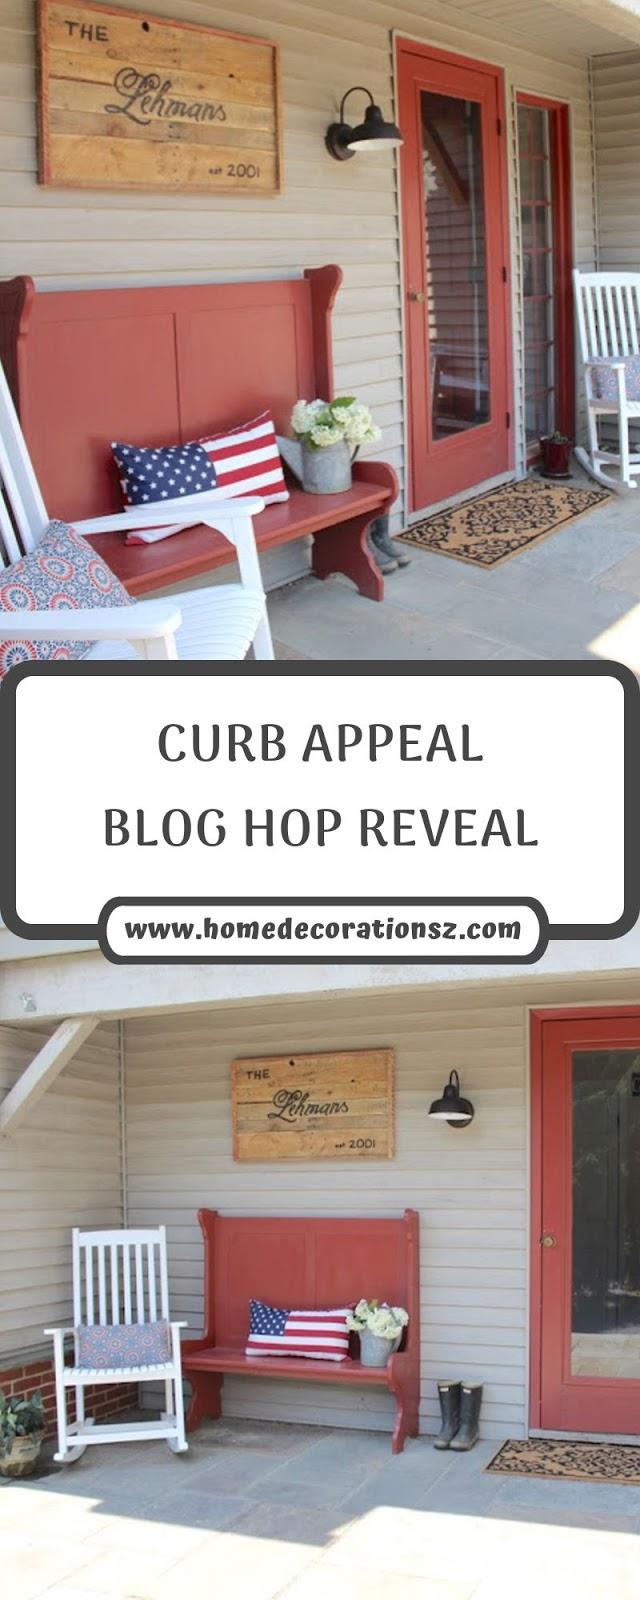 CURB APPEAL BLOG HOP REVEAL